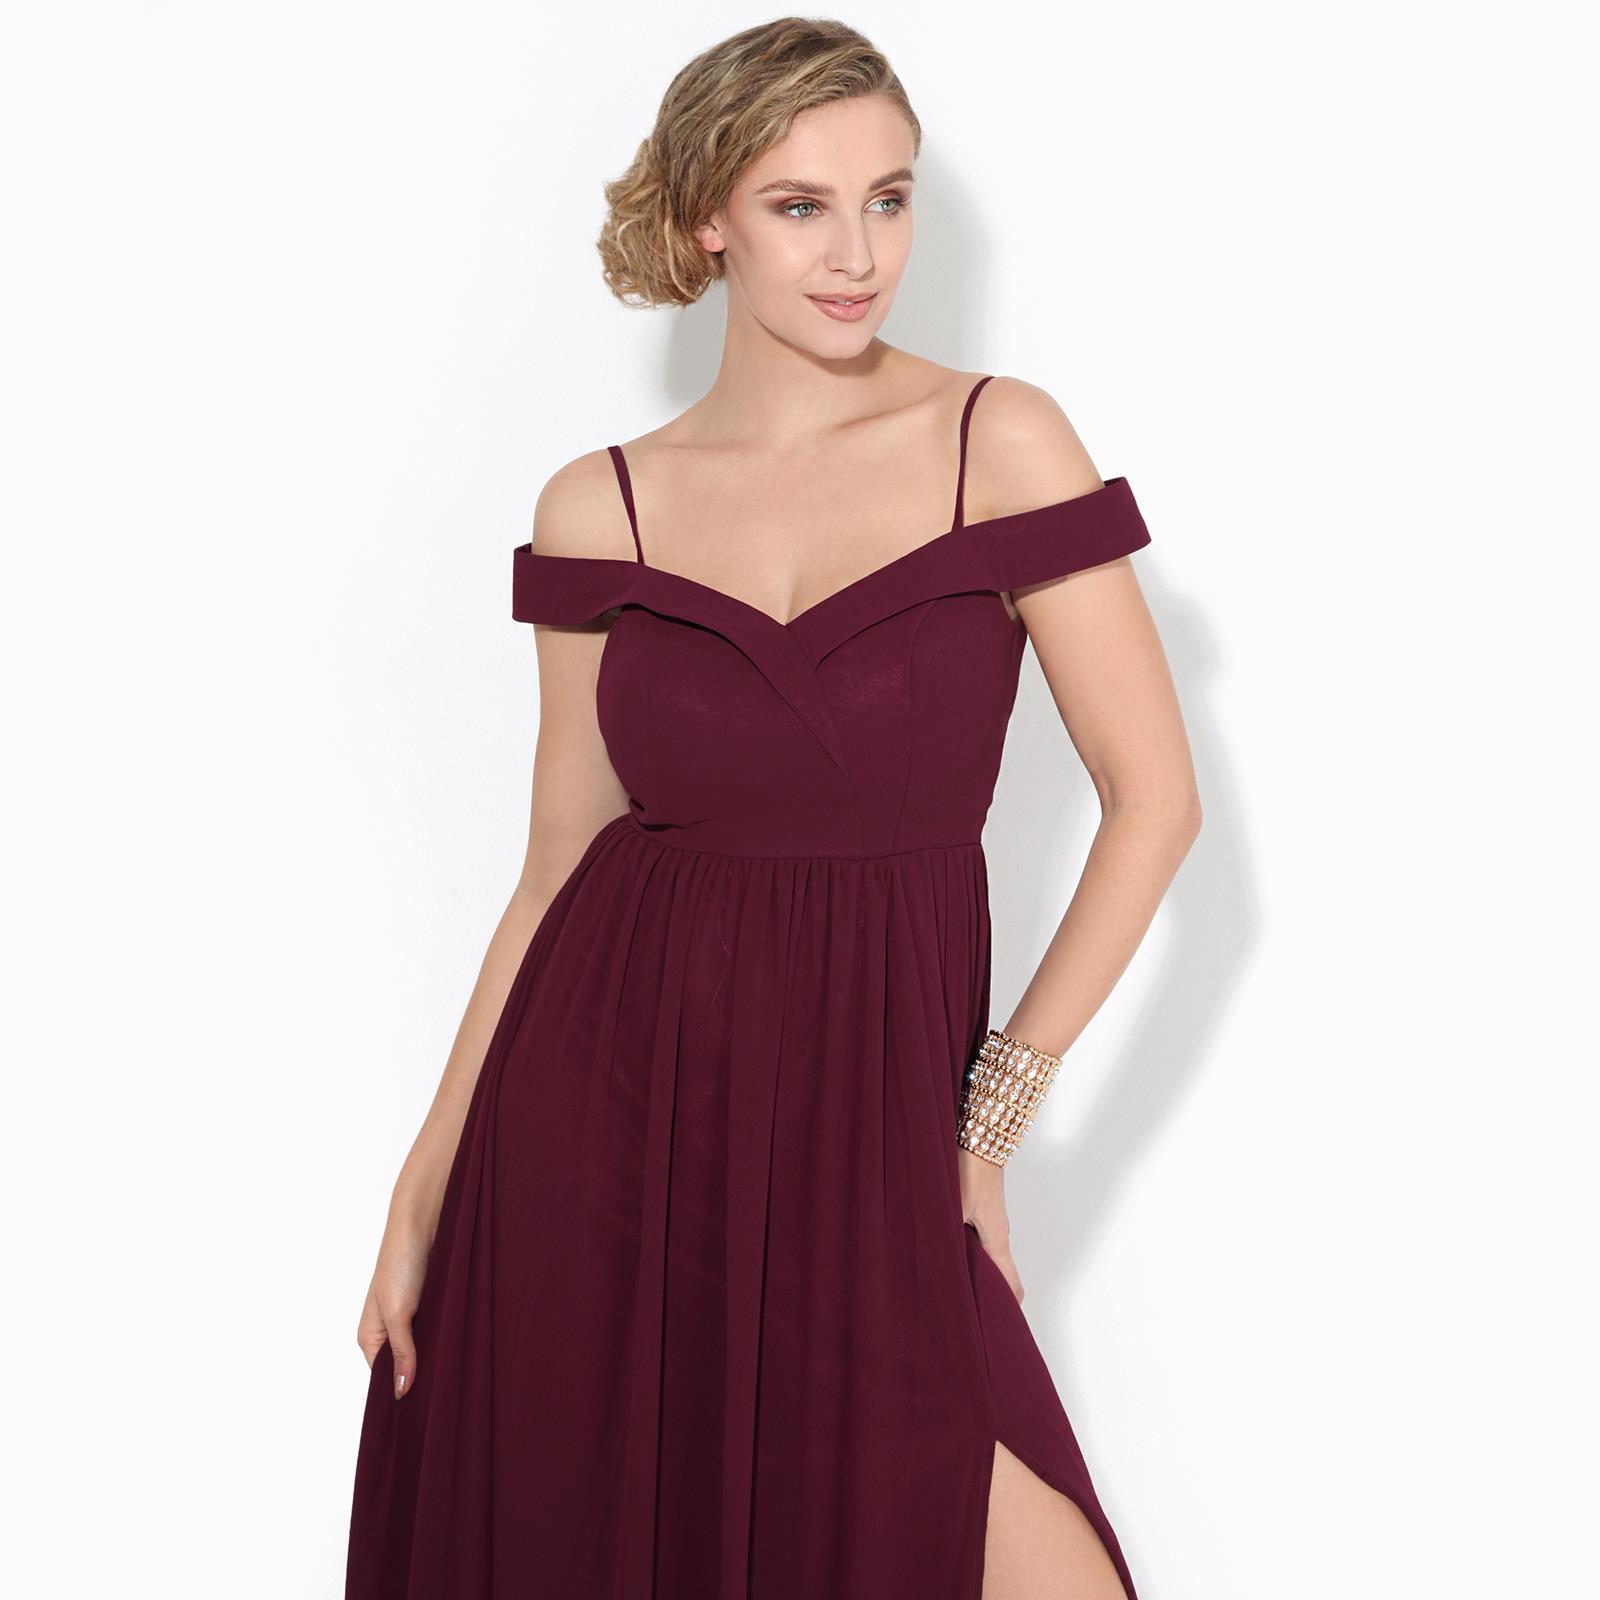 Womens-Ladies-Off-Shoulder-Formal-Maxi-Dress-Slit-Split-Long-Gown-Wedding-Party thumbnail 15